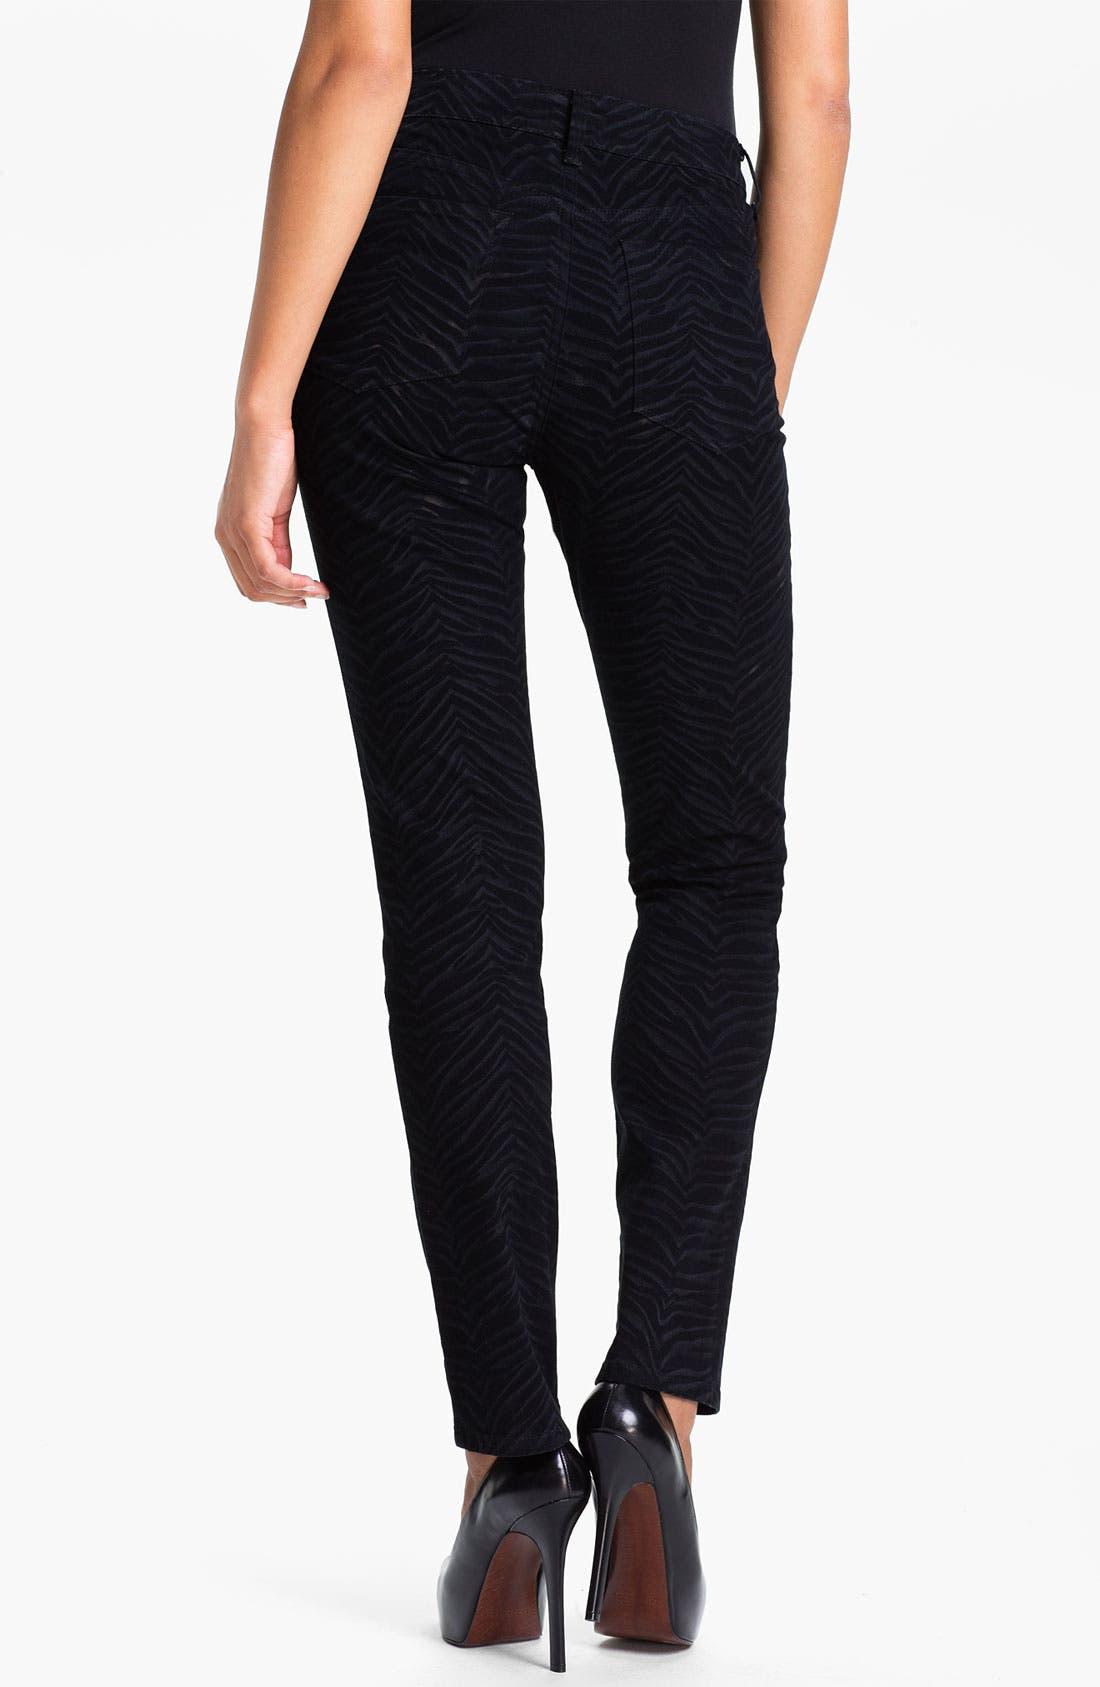 Alternate Image 2  - NYDJ 'Sheri - Zebra' Print Twill Skinny Jeans (Petite)